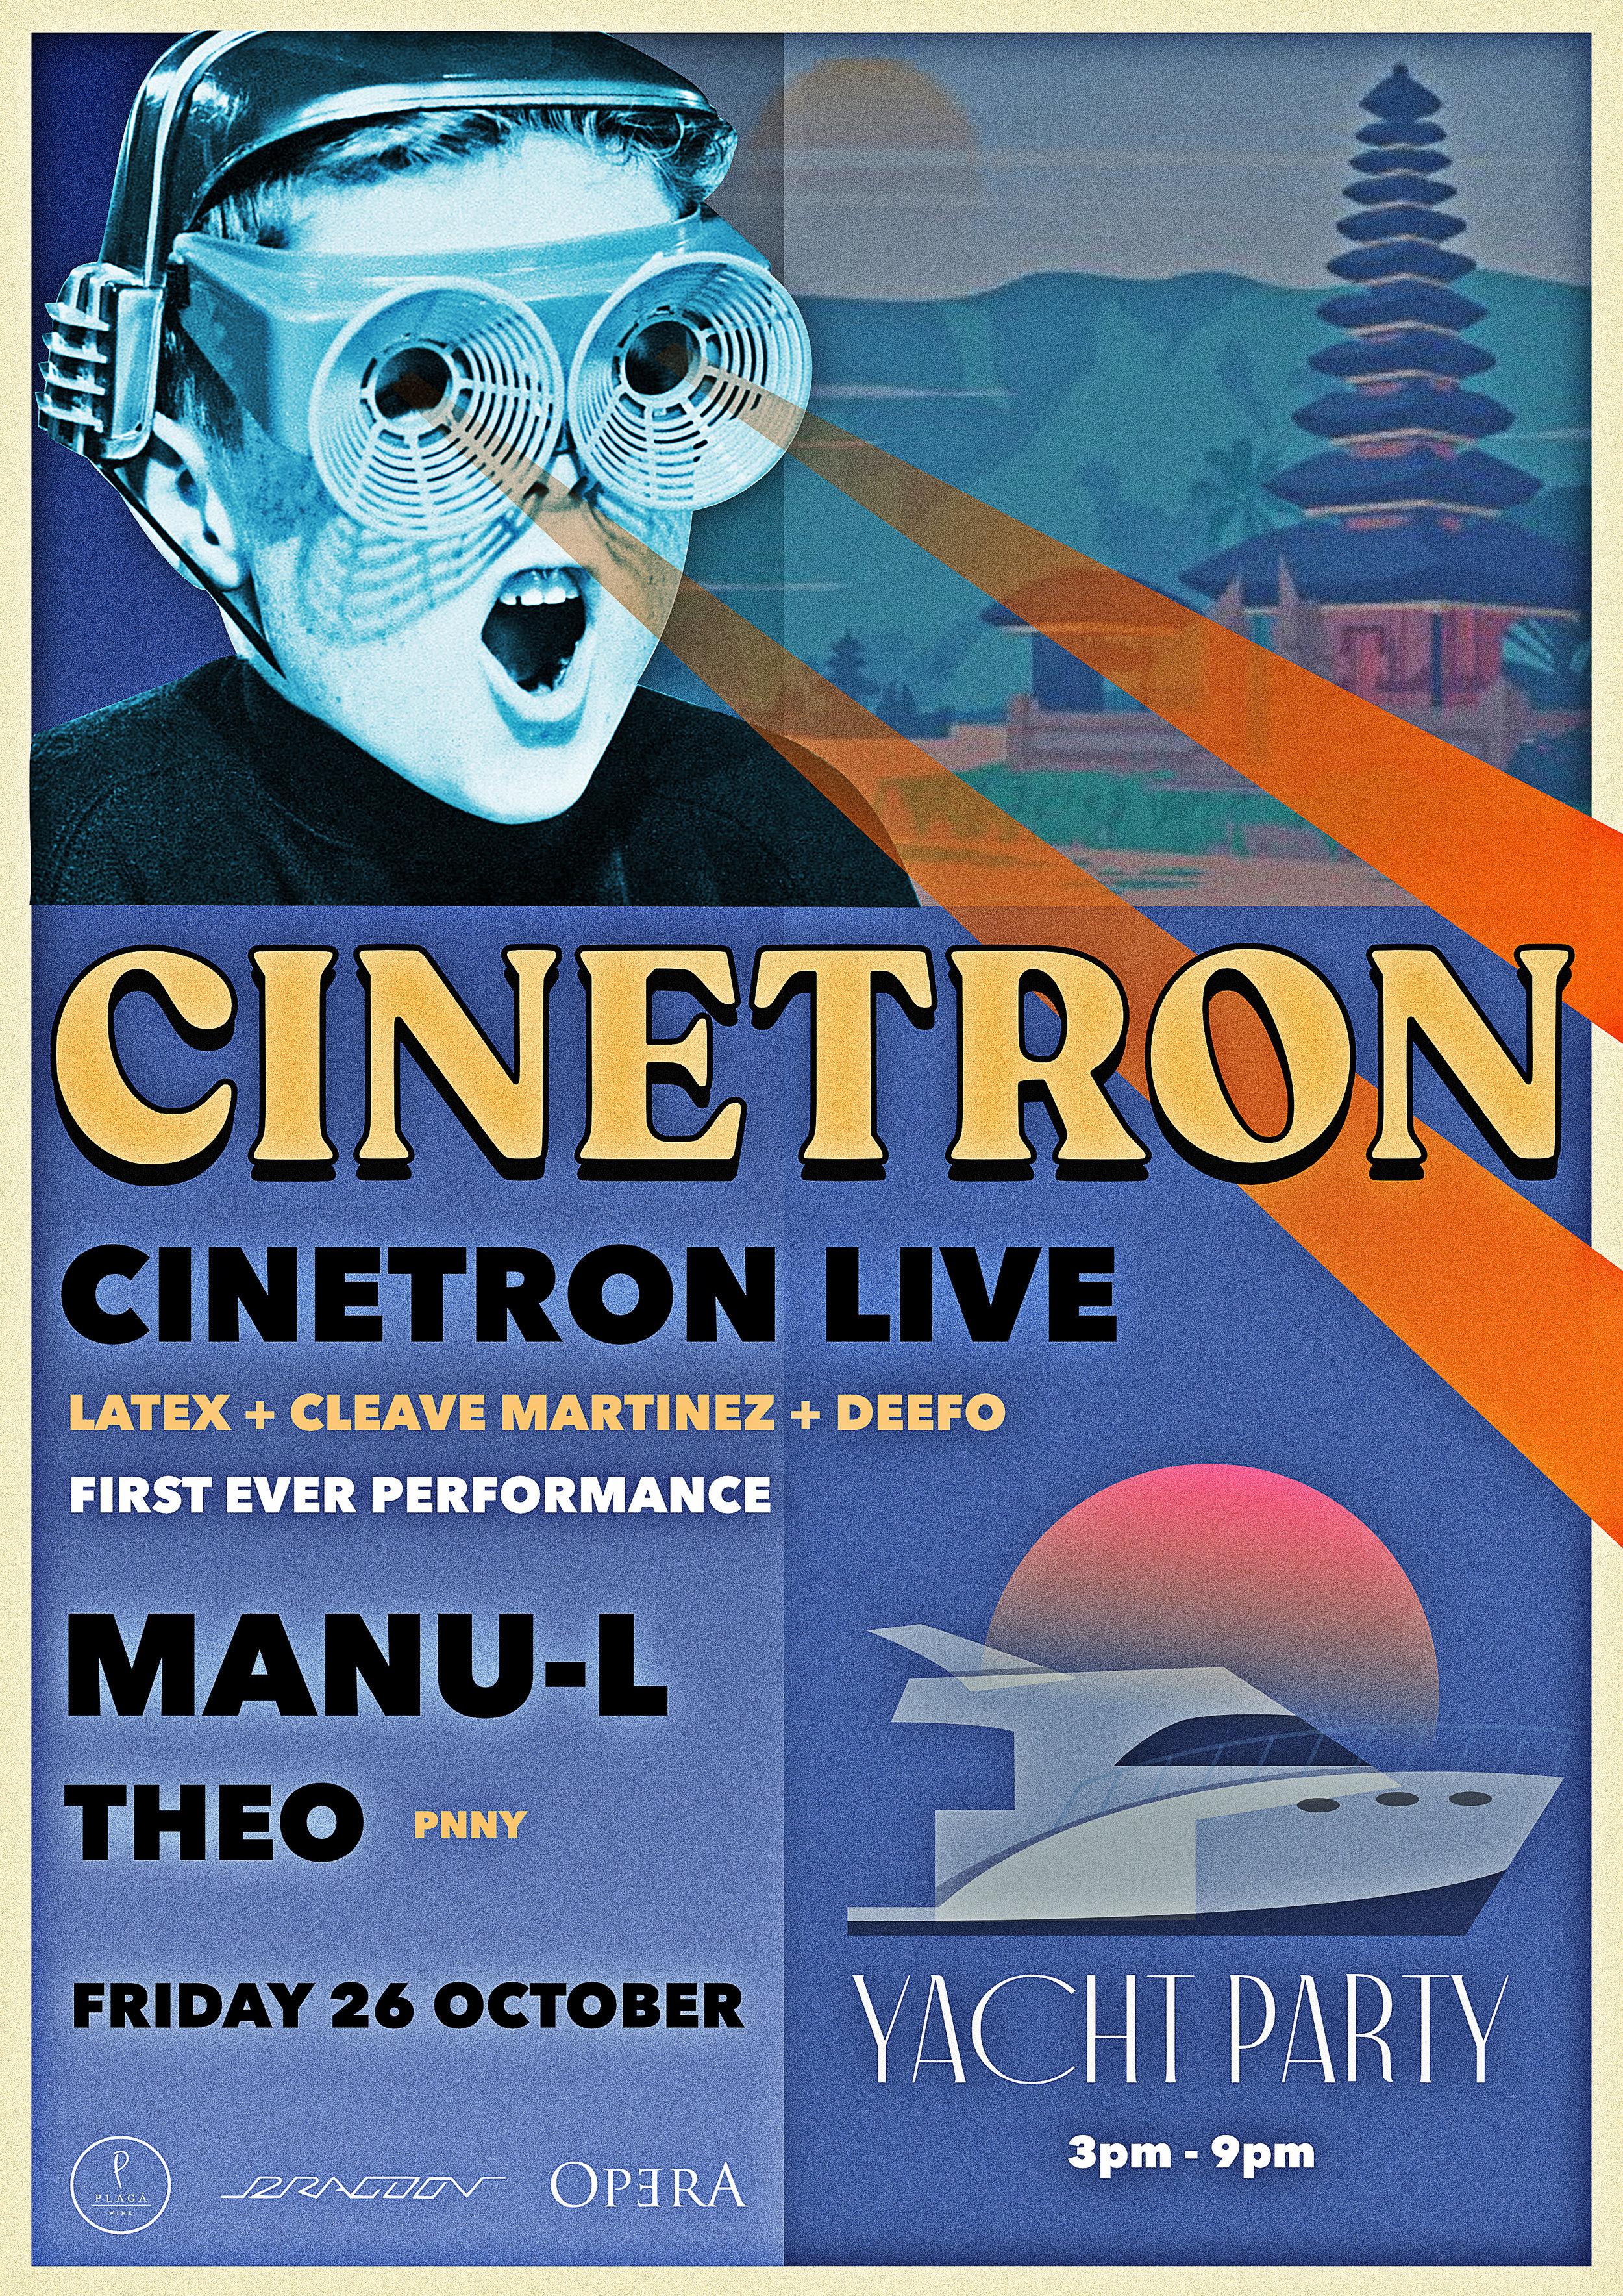 cinetron a3 poster.jpg